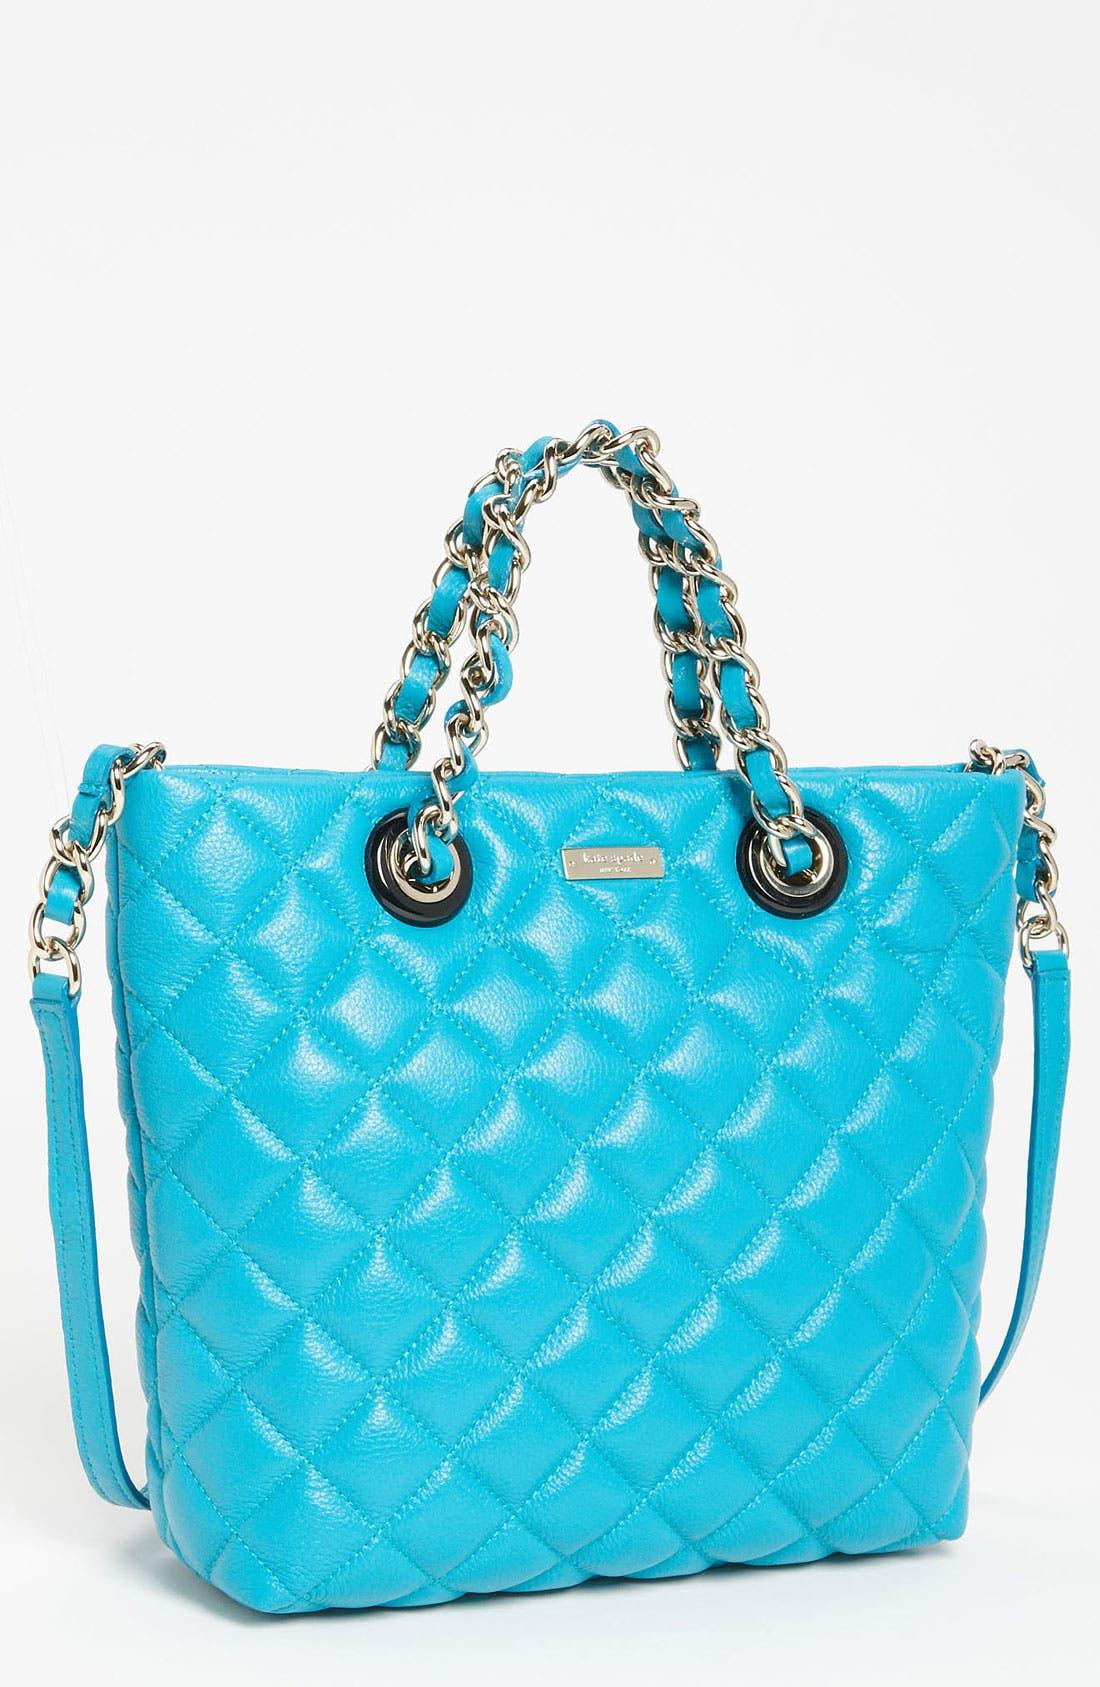 Main Image - kate spade new york 'gold coast - lilou' satchel